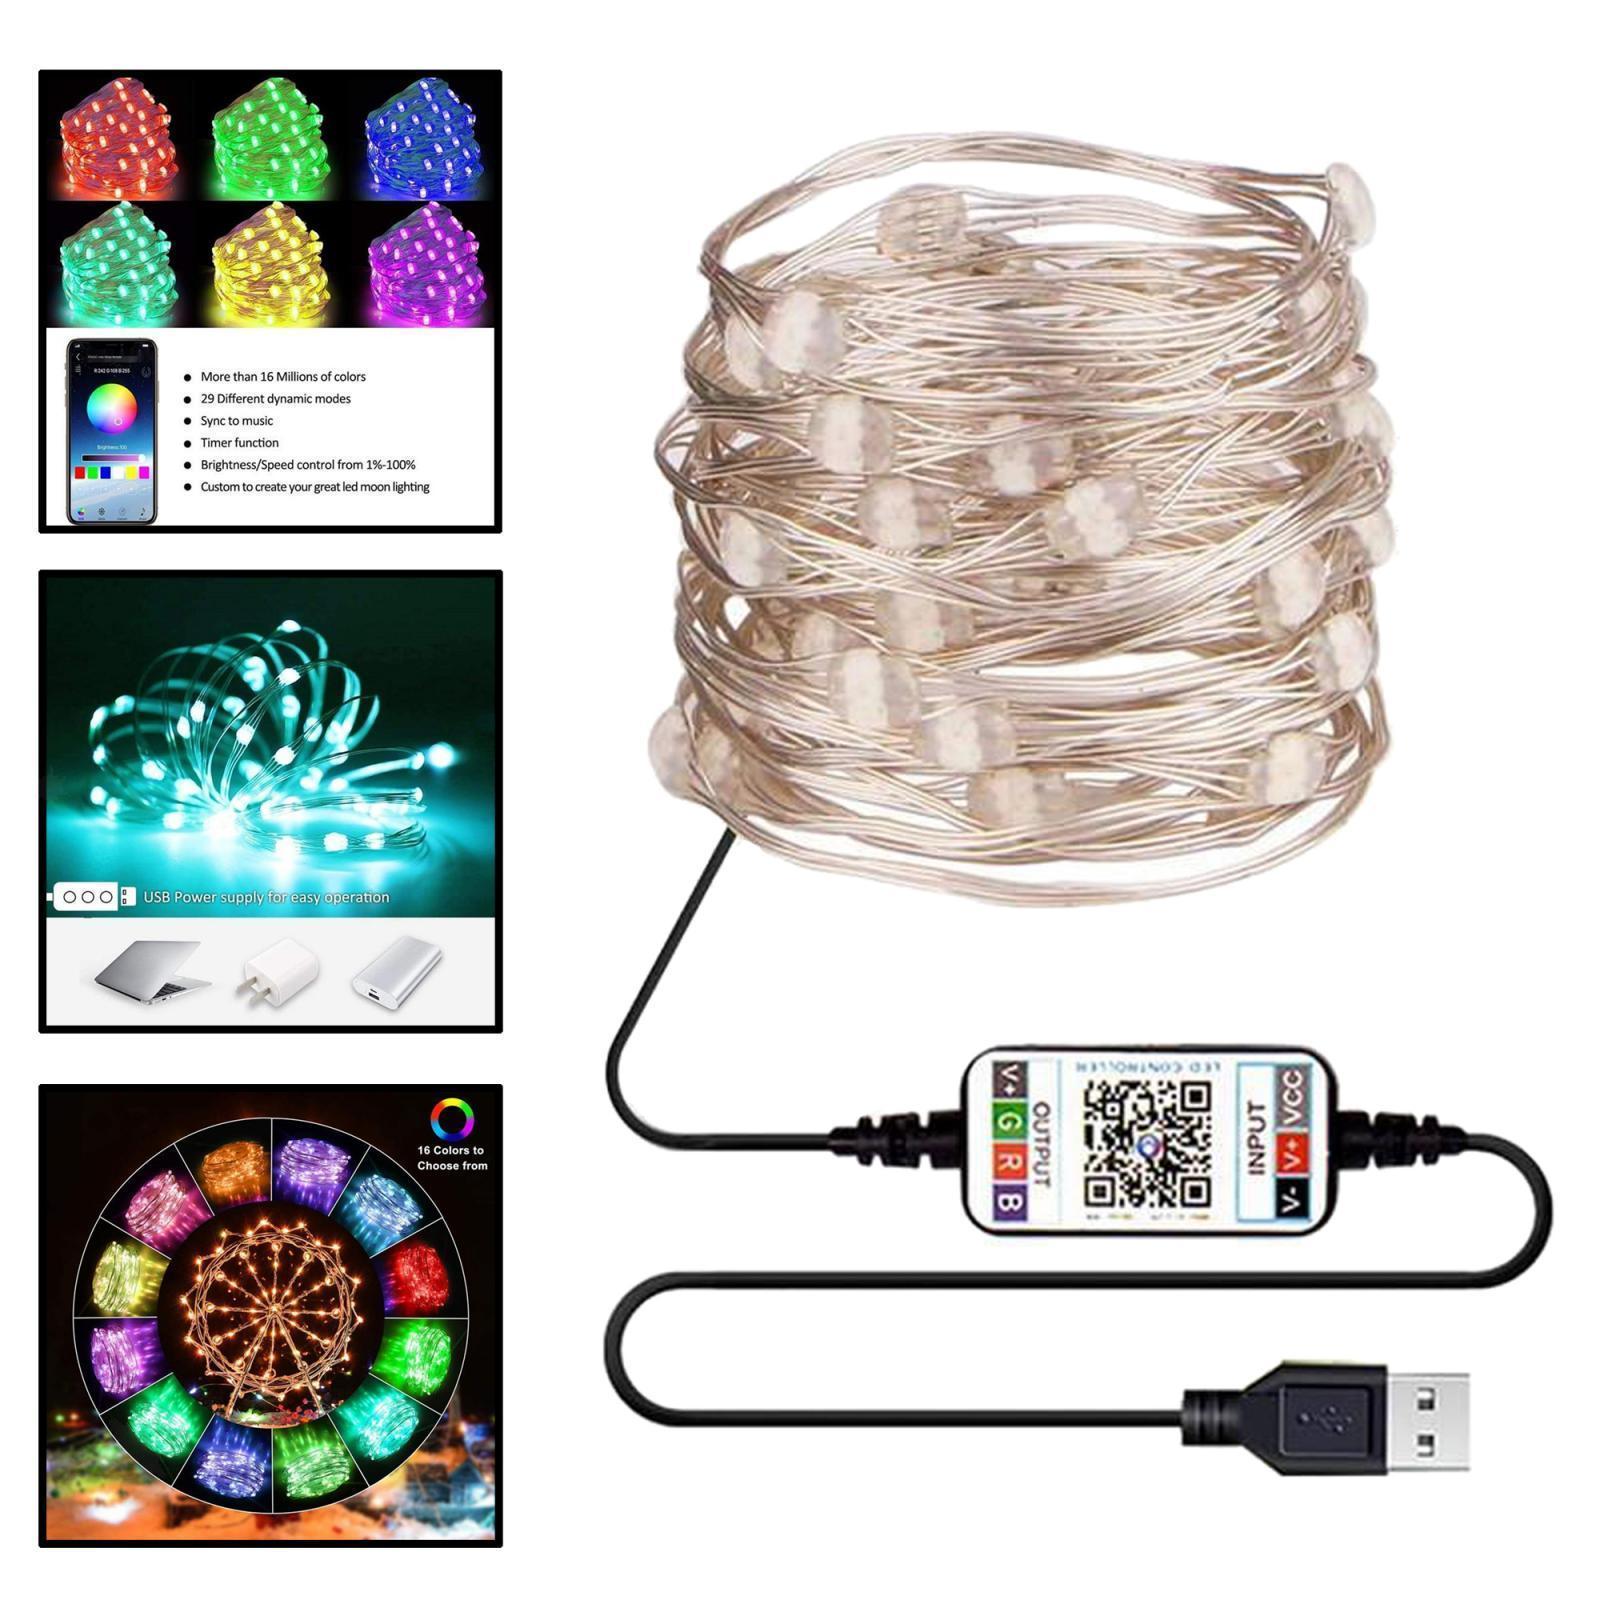 miniature 4 - LED Fée Guirlande Lumineuse Rideau Fenêtre De Mariage Party Decor App Contrôl